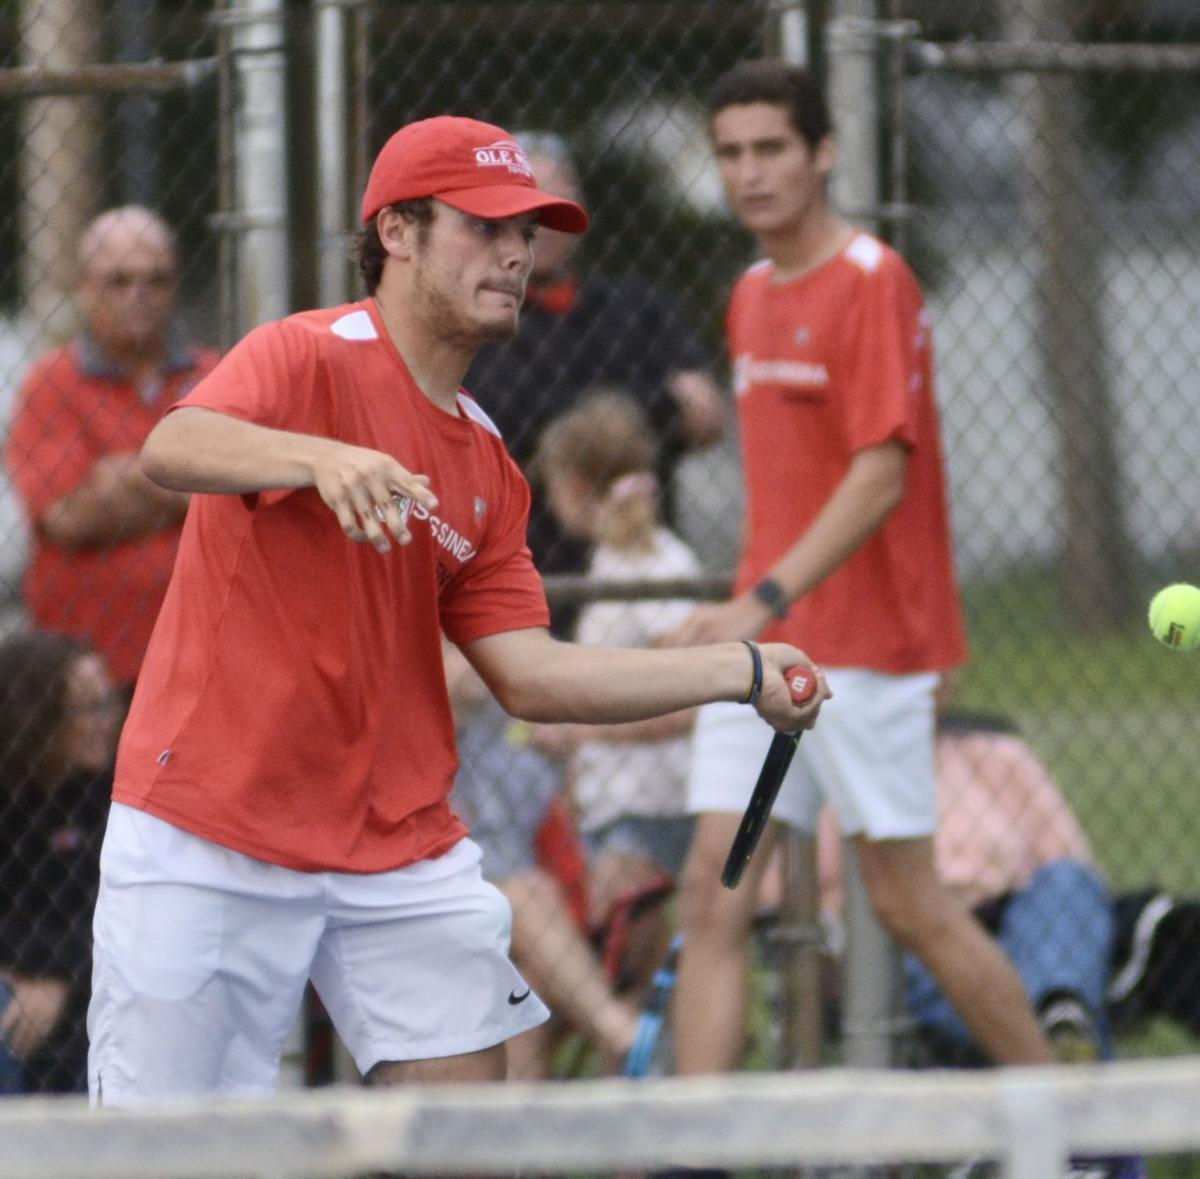 miss tennis champs (P2)